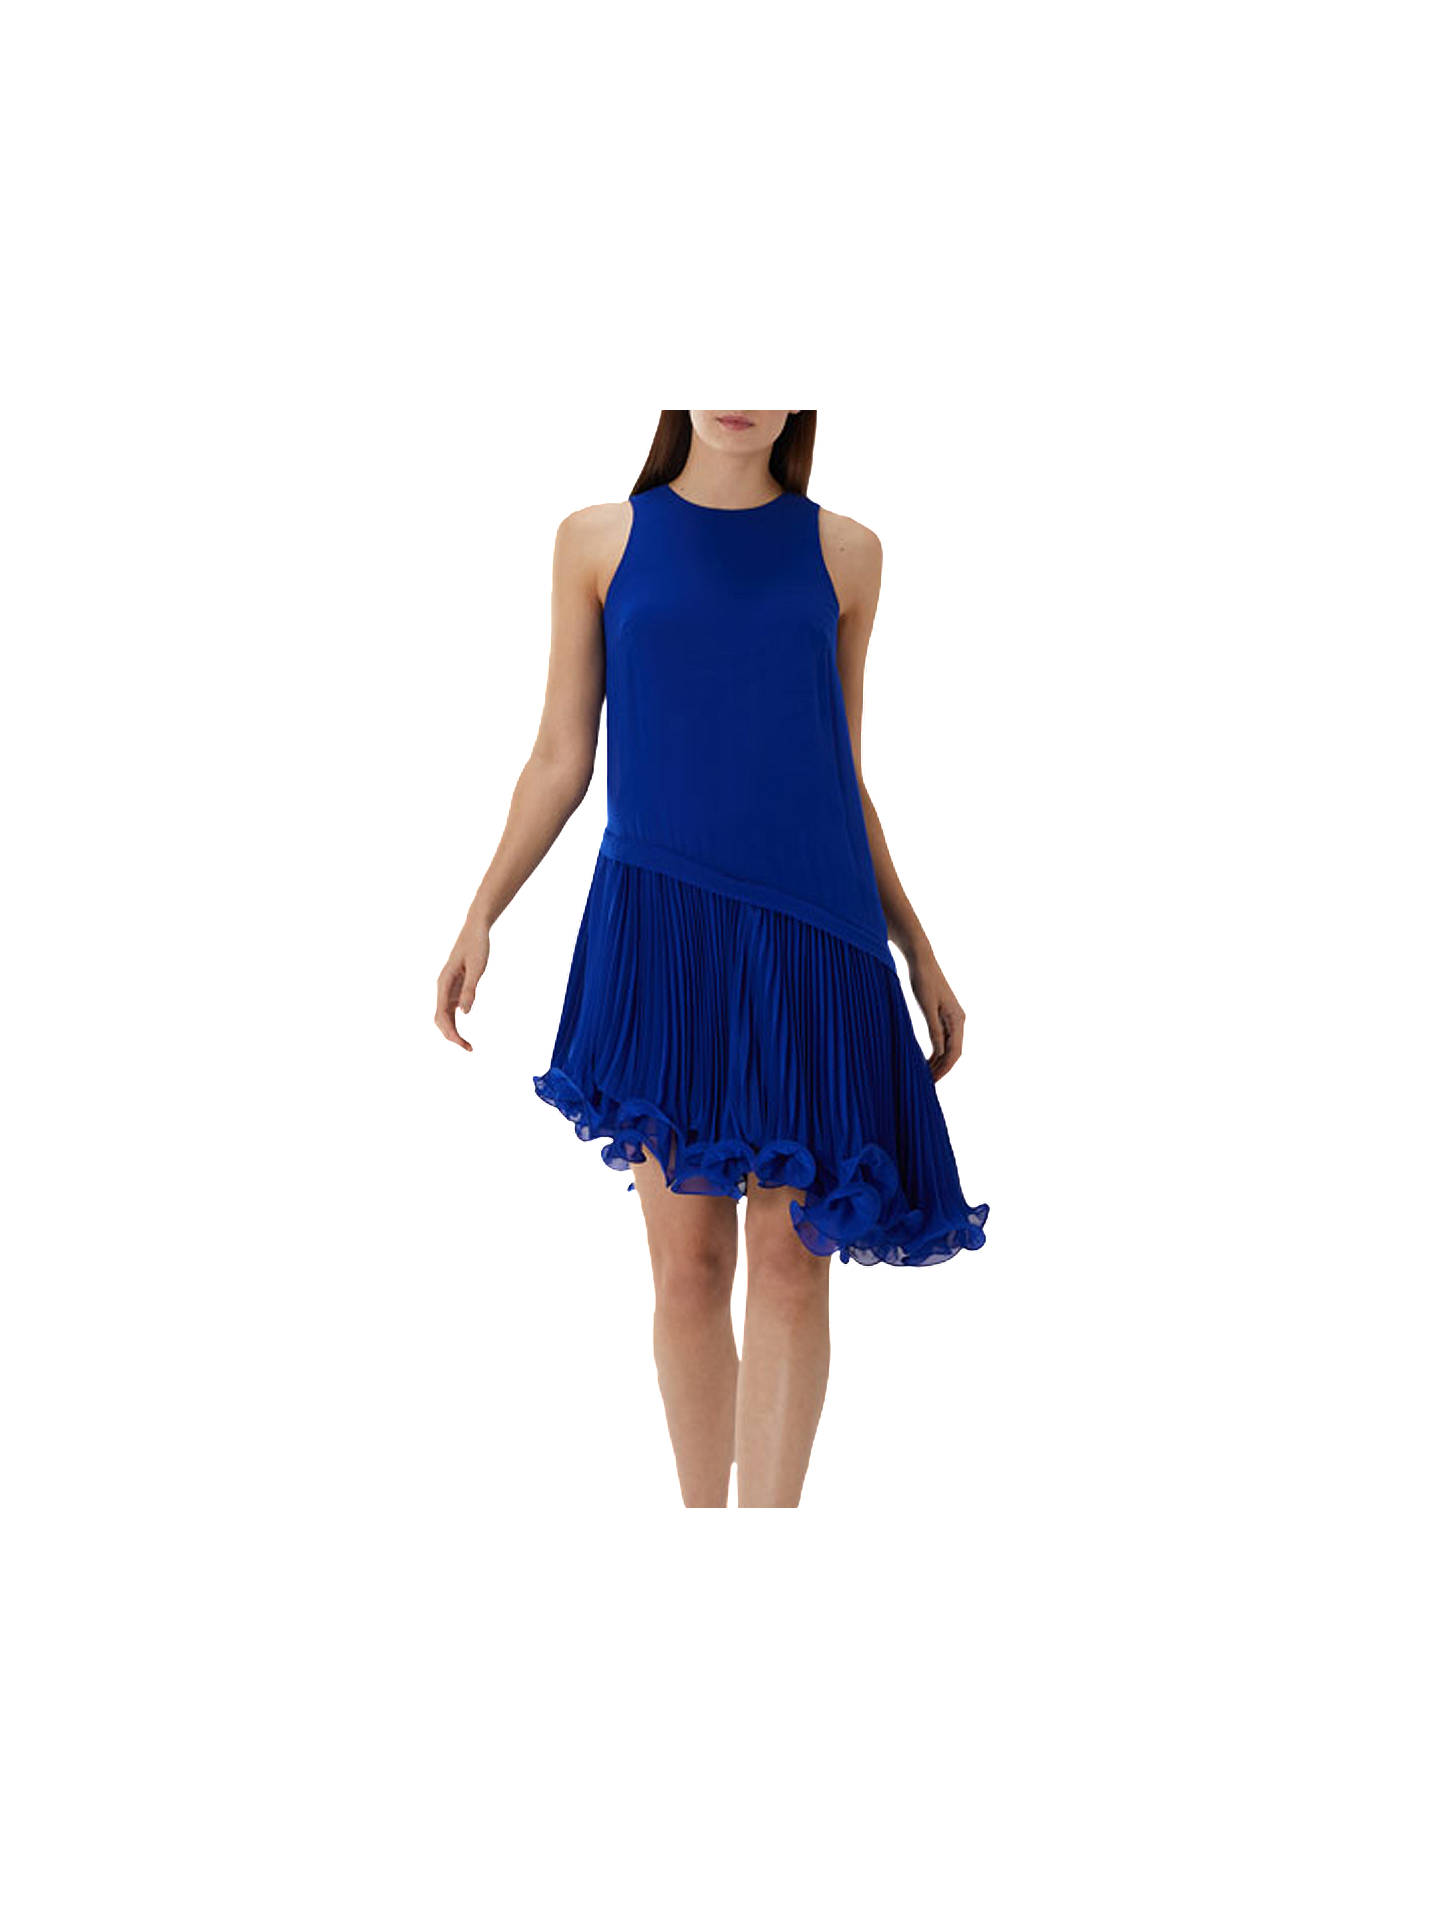 6fe362b48df27 Buy Coast Peyton Dress, Cobalt Blue, 6 Online at johnlewis.com ...